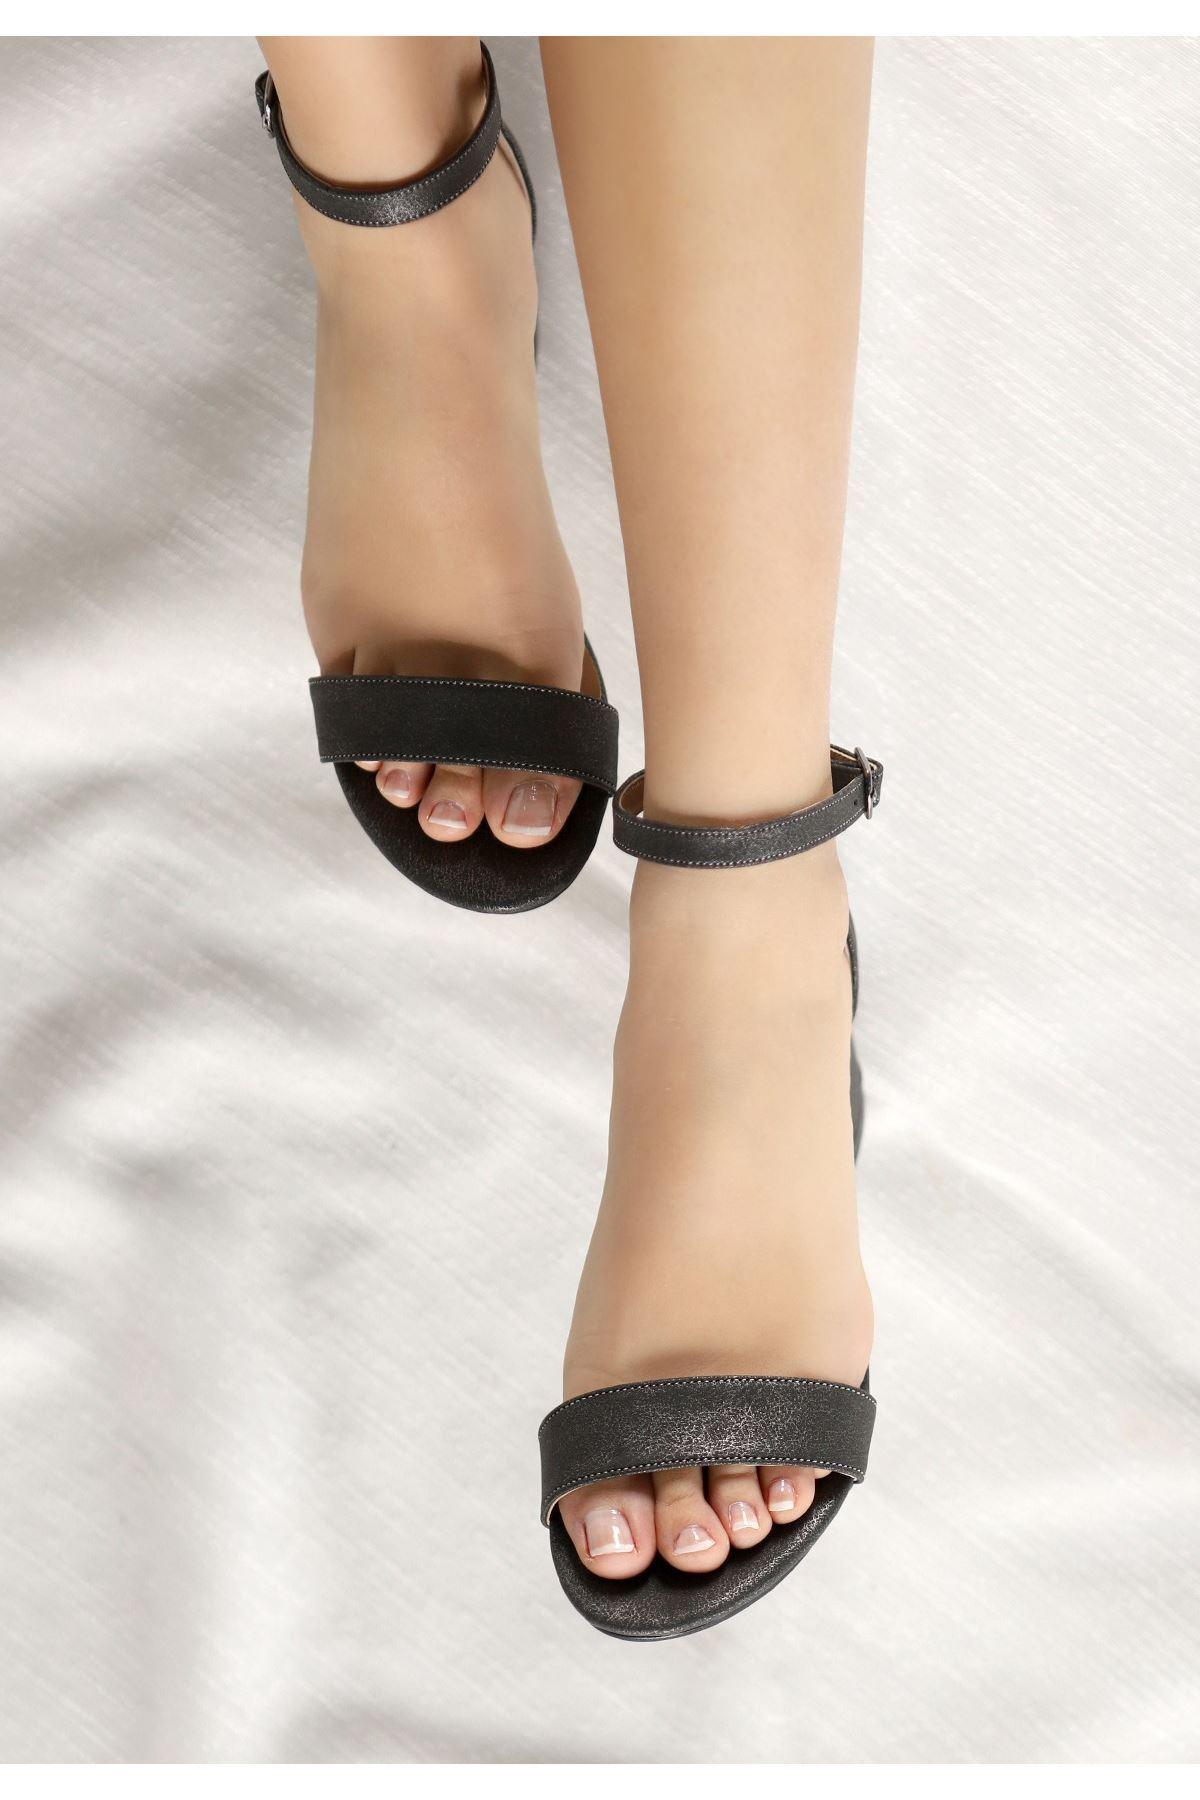 Epon Füme Cilt Desenli Tek Bant Topuklu Ayakkabı